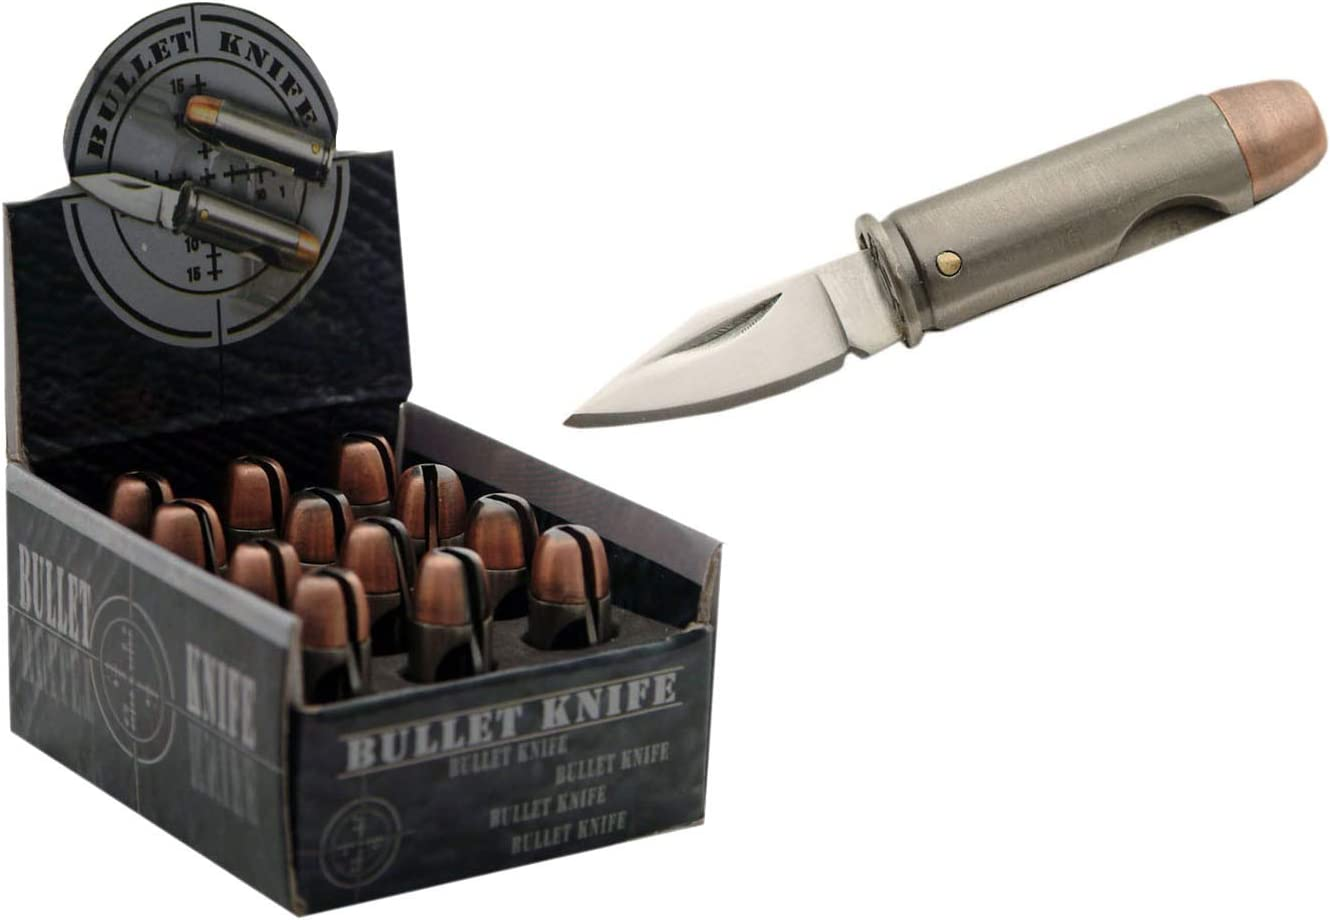 SZCO Supplies 44 Magnum Bullet Knife Display, 12-Piece